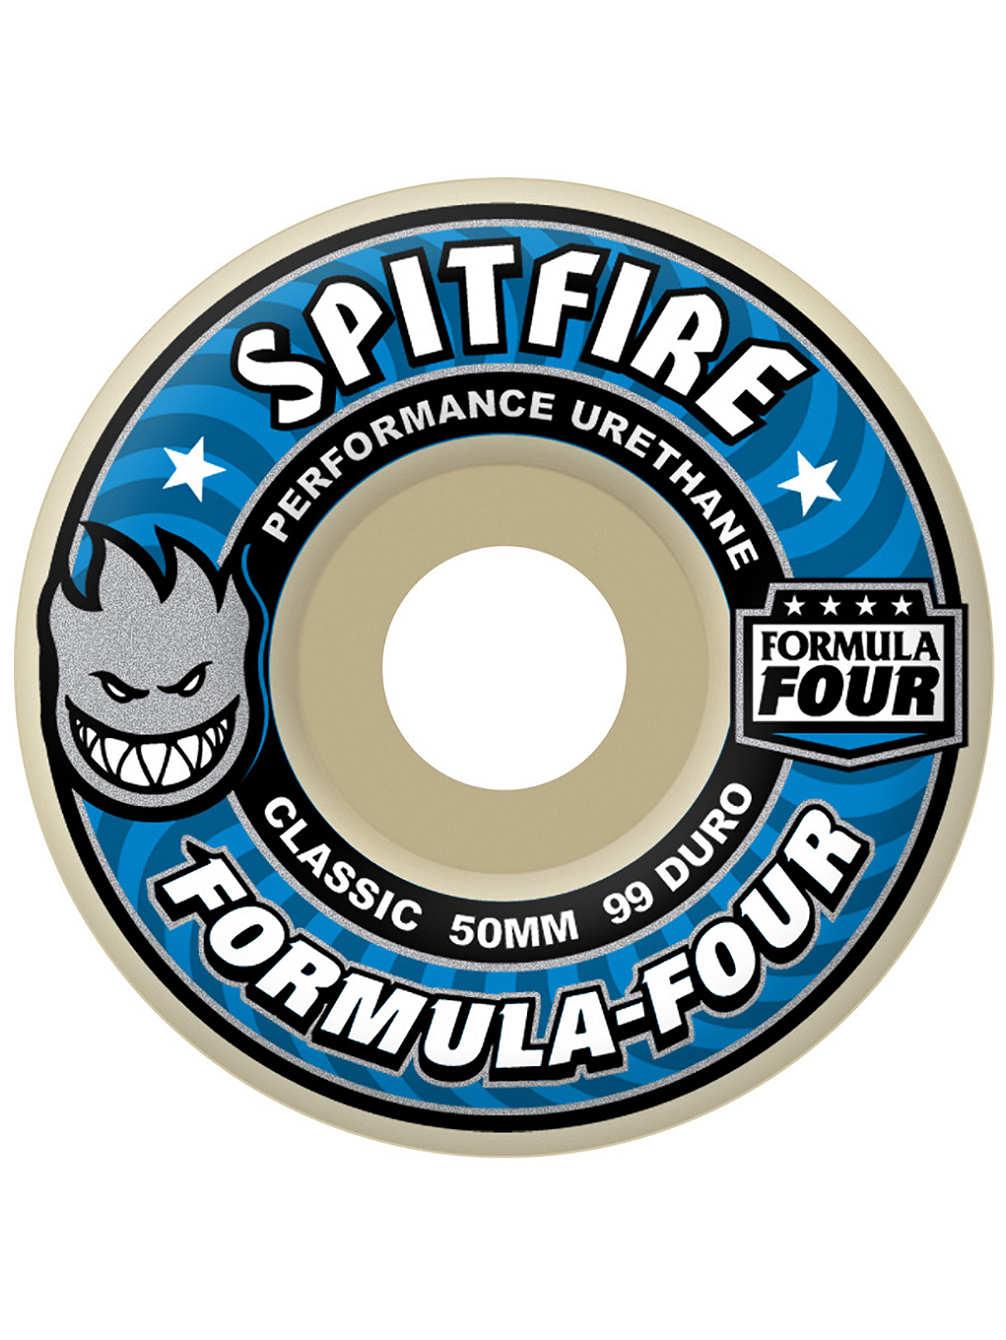 Formula+Four+99+Duro+Classic+55mm+Rollen.jpg